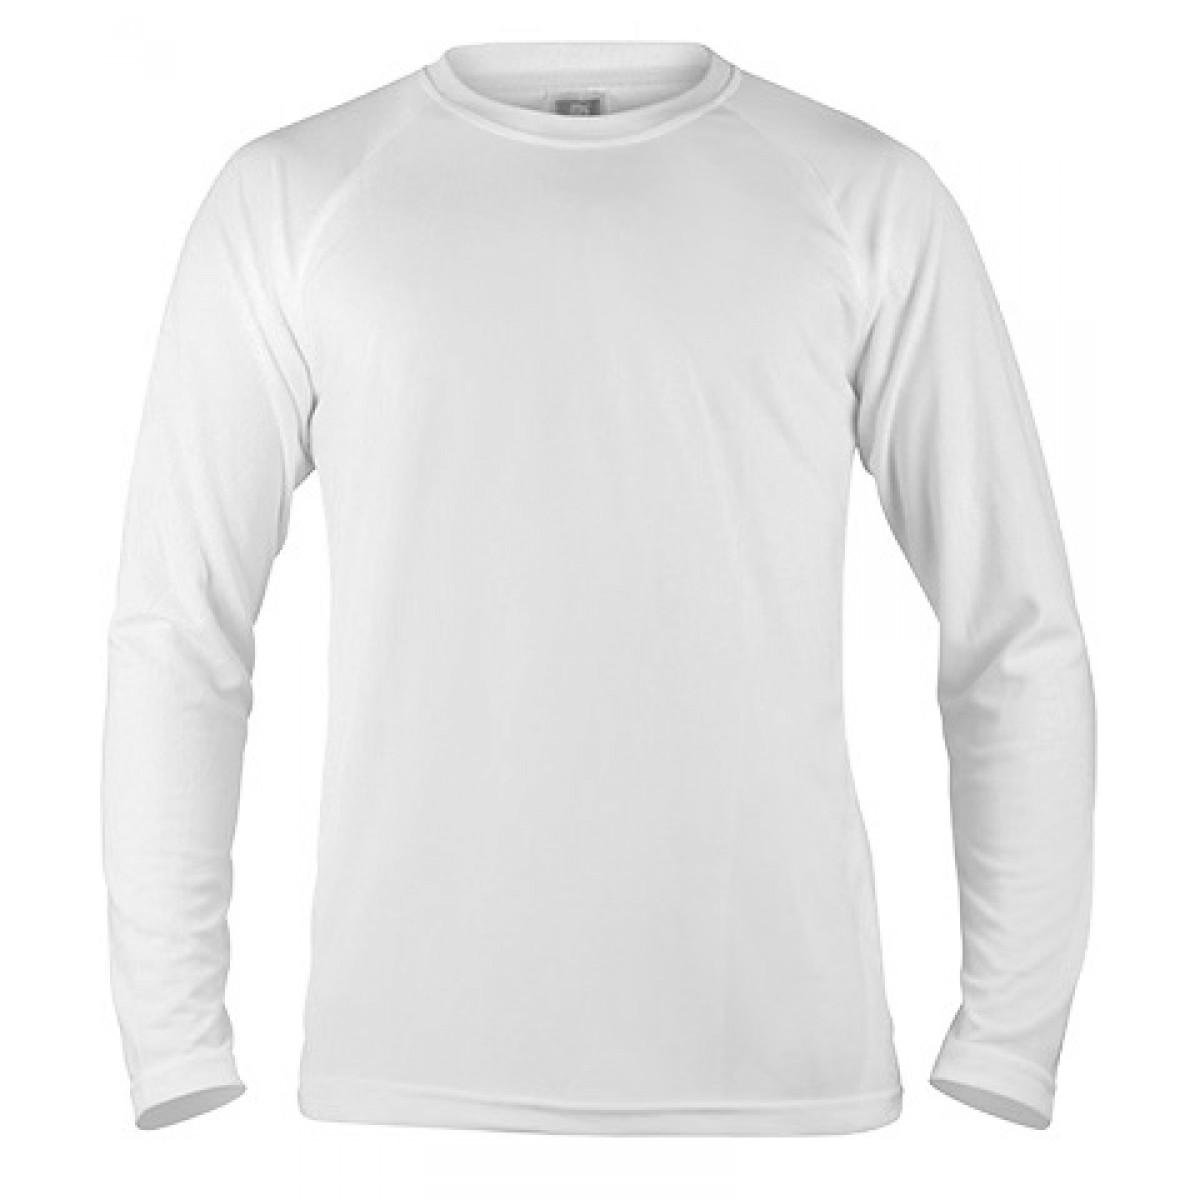 Long Sleeve Mesh Performance T-shirt-White-M